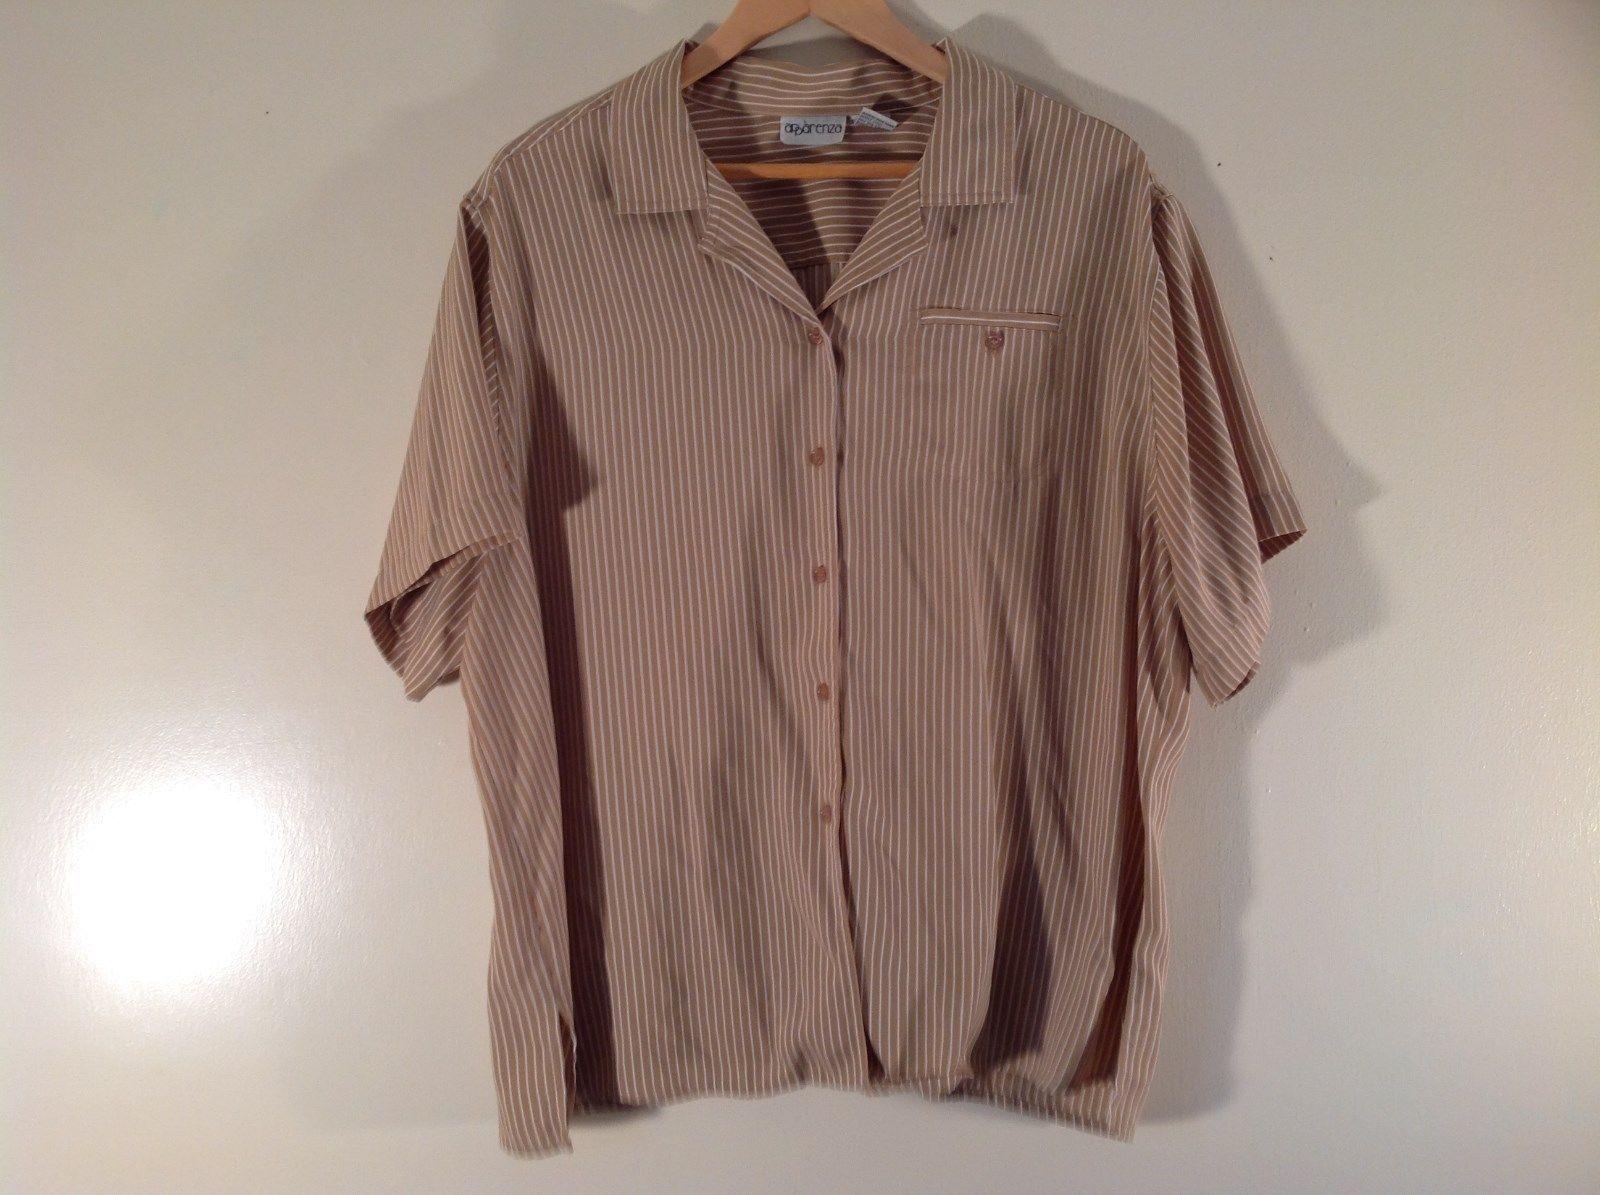 Apparenza Short Sleeve Light Brown Shirt Shirt Size 24W Excellent Condition